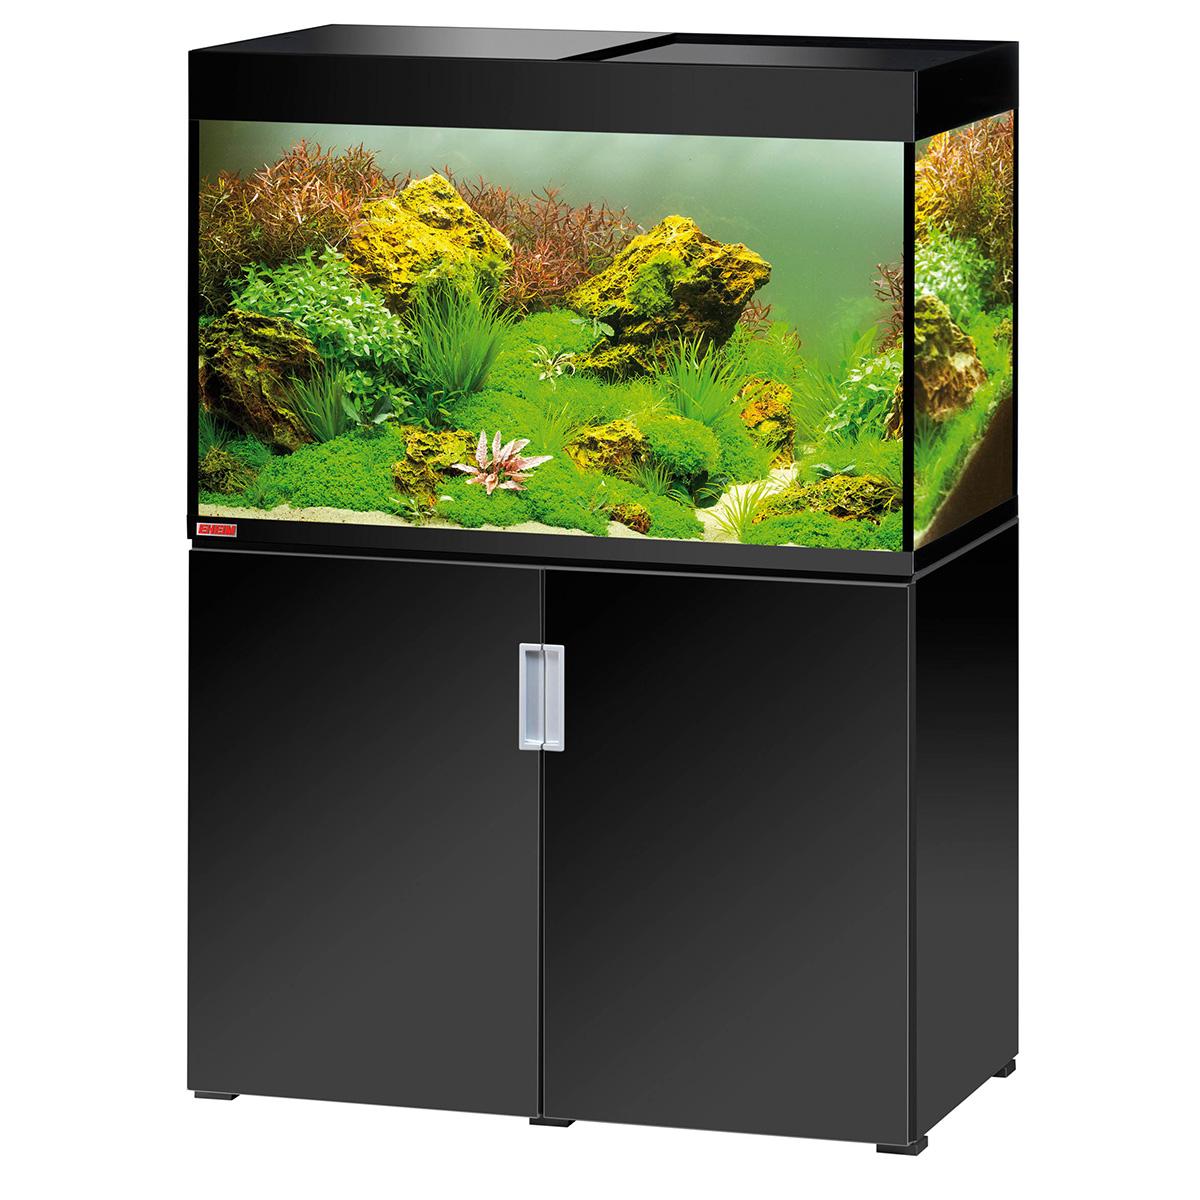 Led Aquarium Leuchte defekt